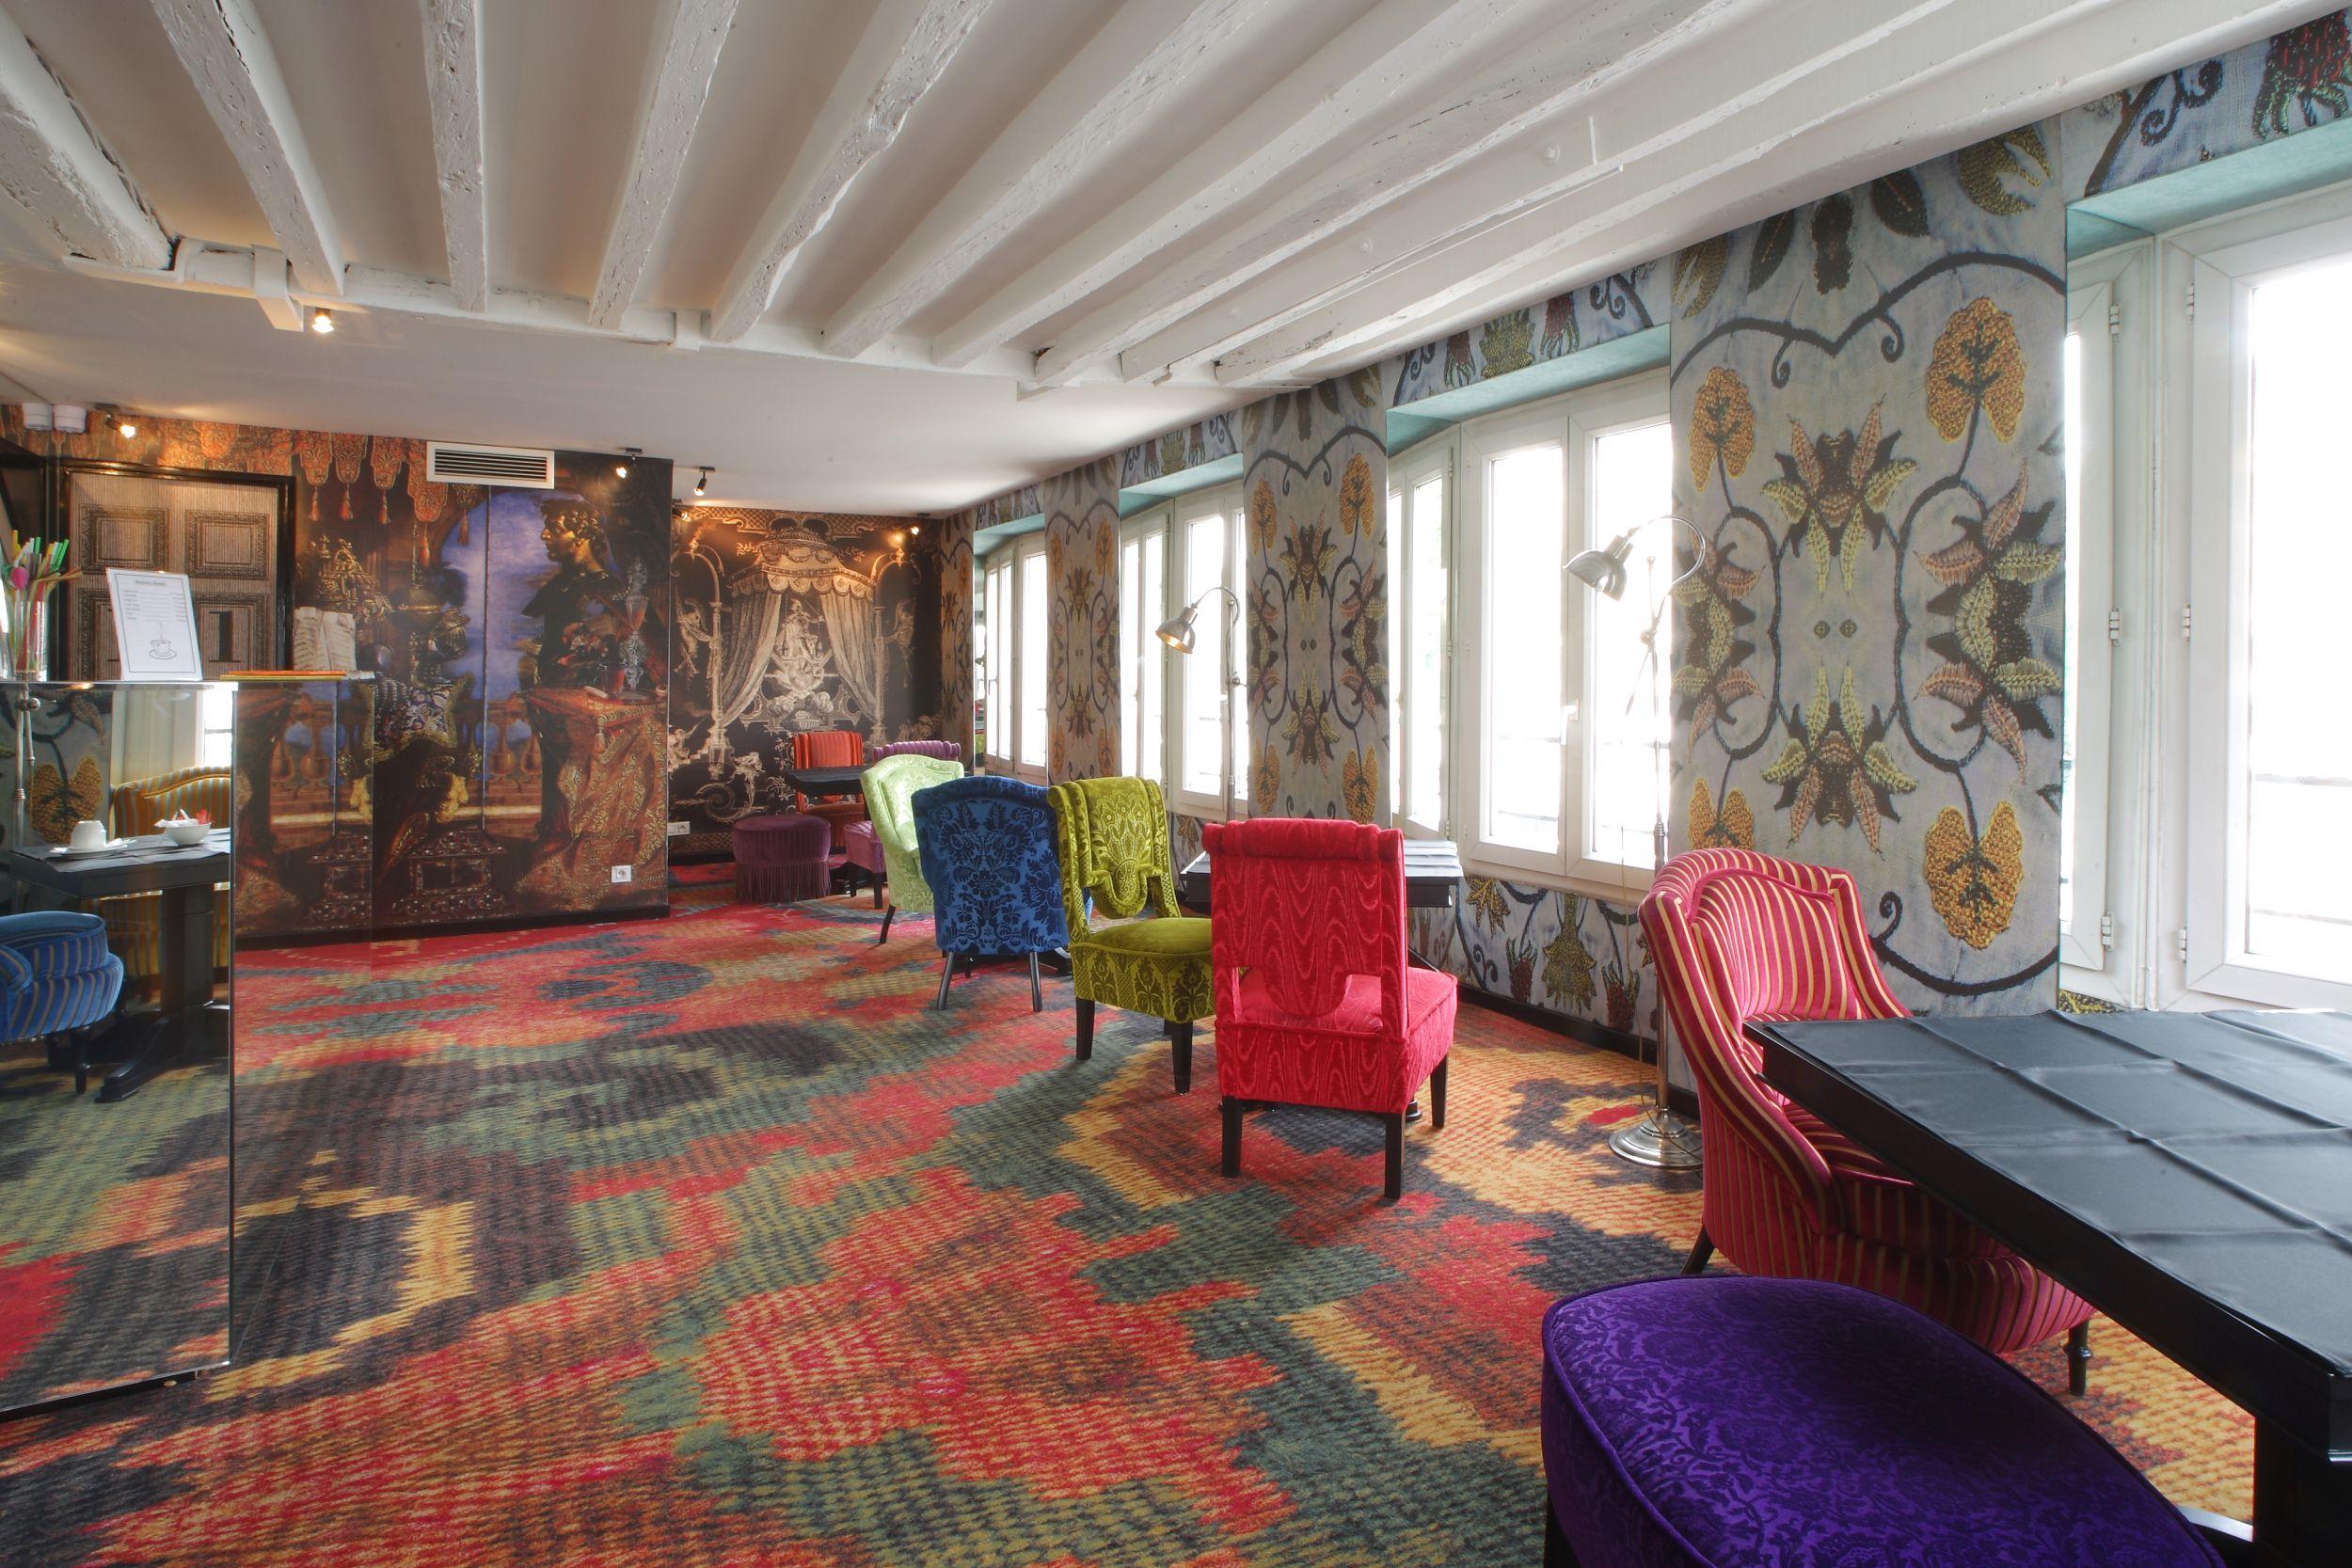 Location hotel notre dame france carpet design by mr christian carpet design baanklon Gallery